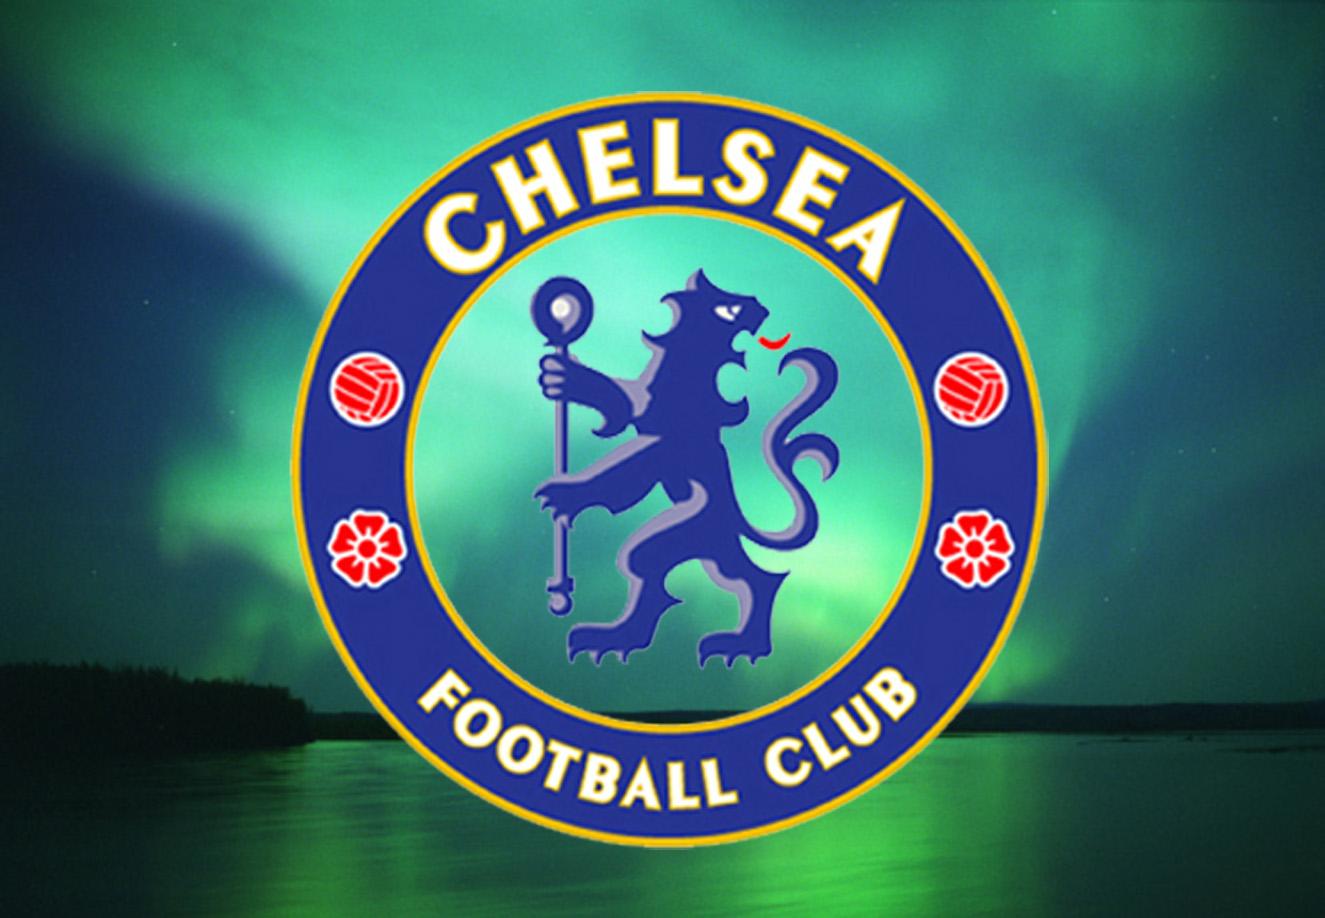 75 ] Chelsea Fc Logo Wallpaper On WallpaperSafari